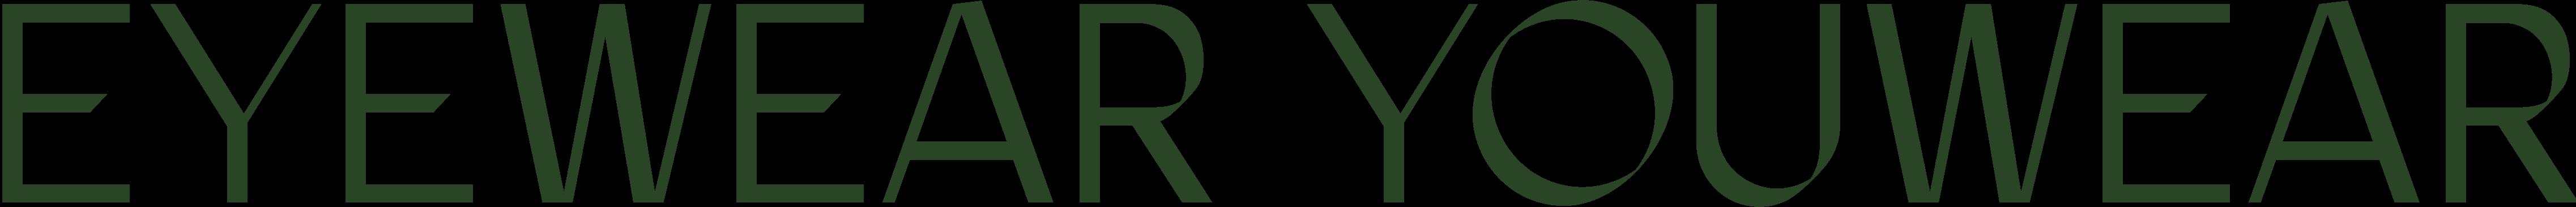 logo for Eyewear Youwear Optometrists